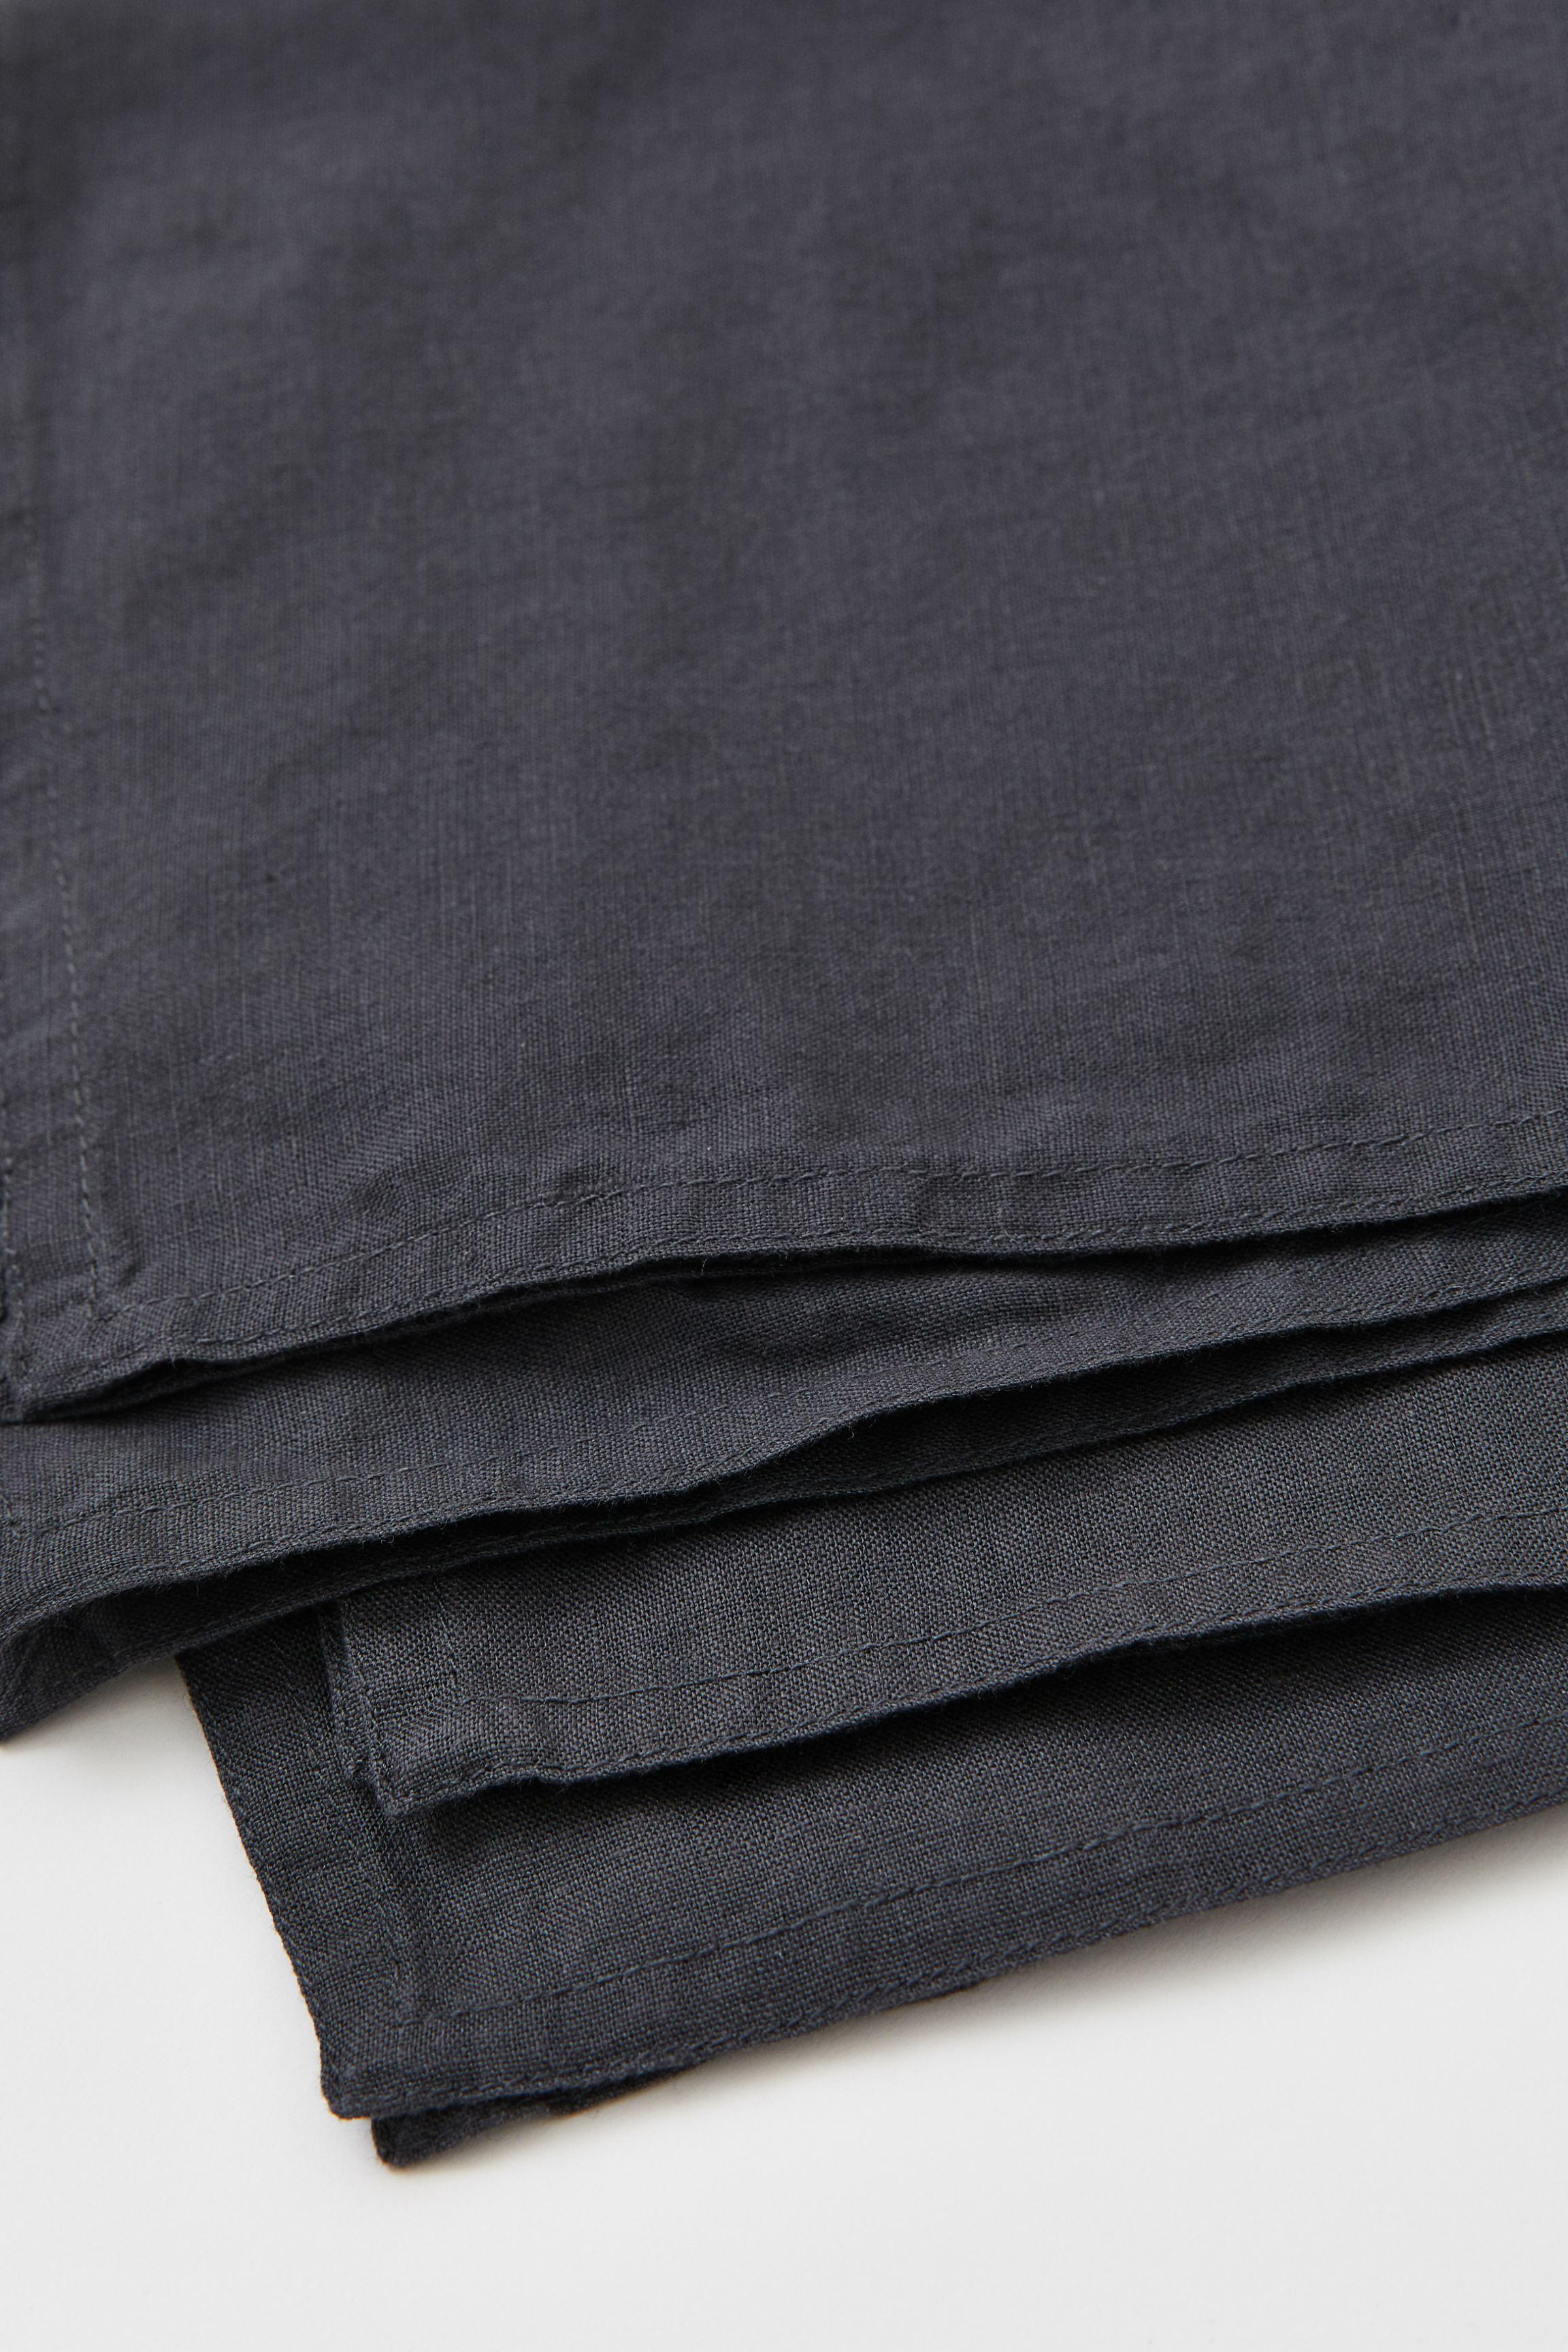 2-pack Linen Napkins